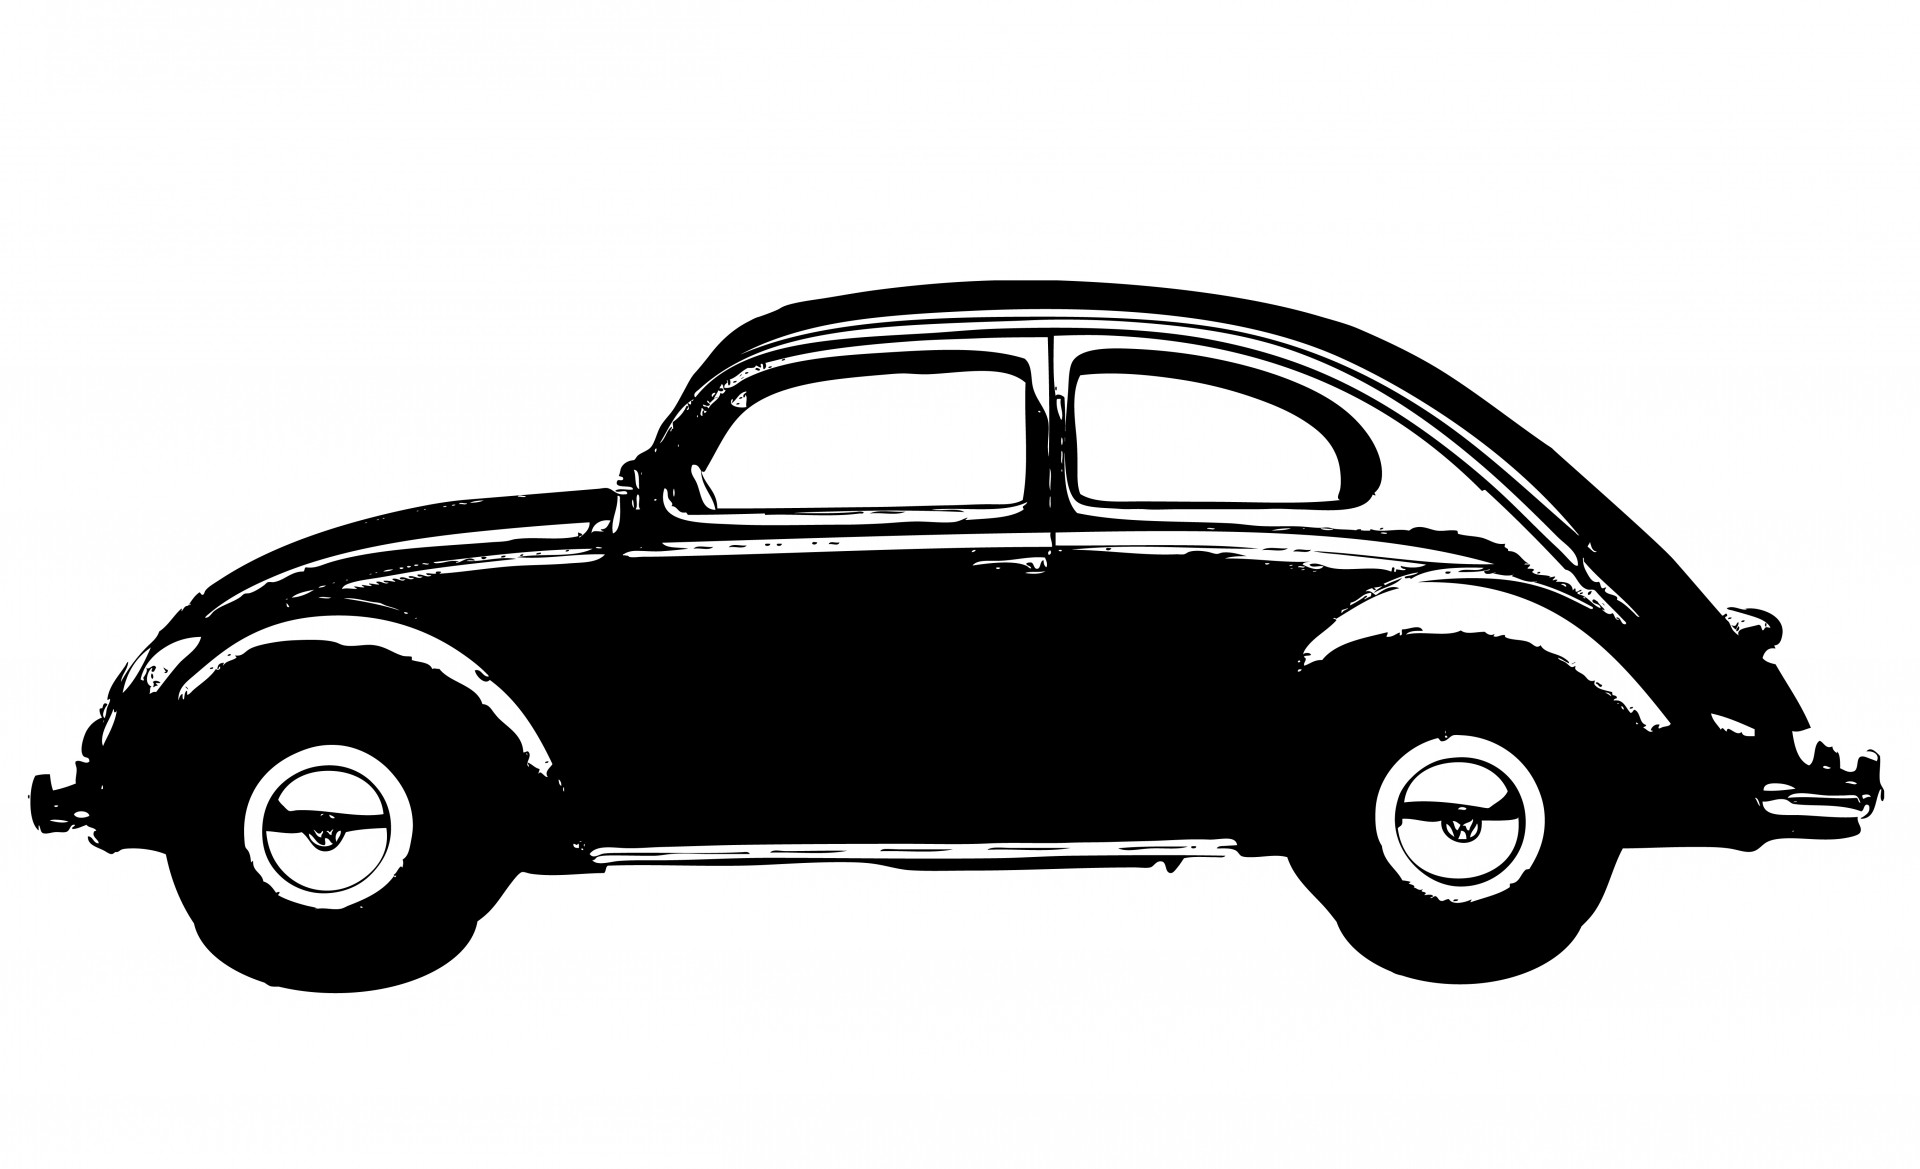 Classic clipart old fashioned car Free Car Clipart Car Public